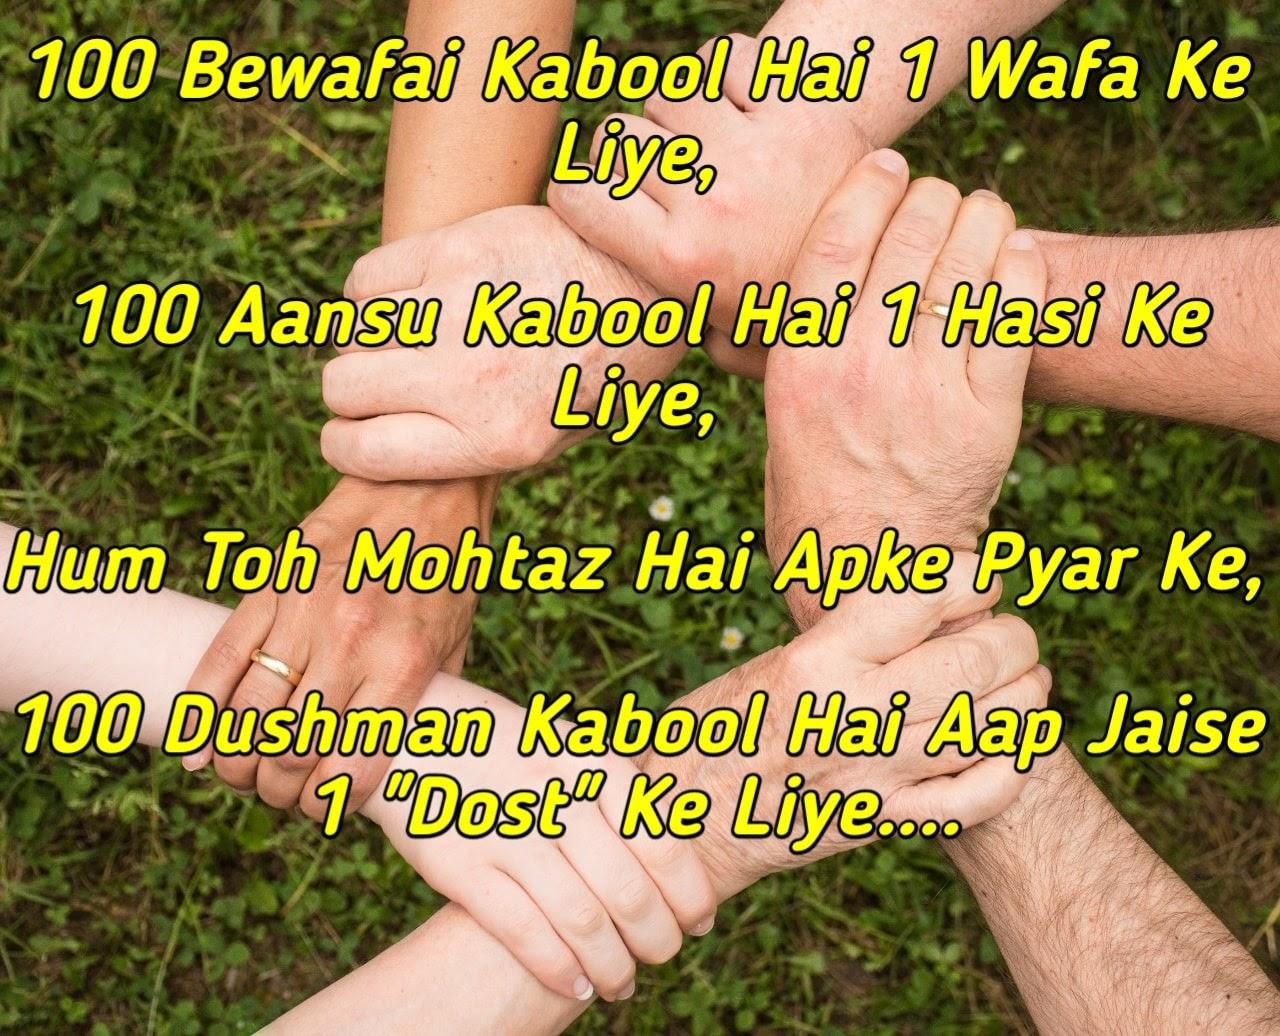 Awesome dosti shayri in Hindi